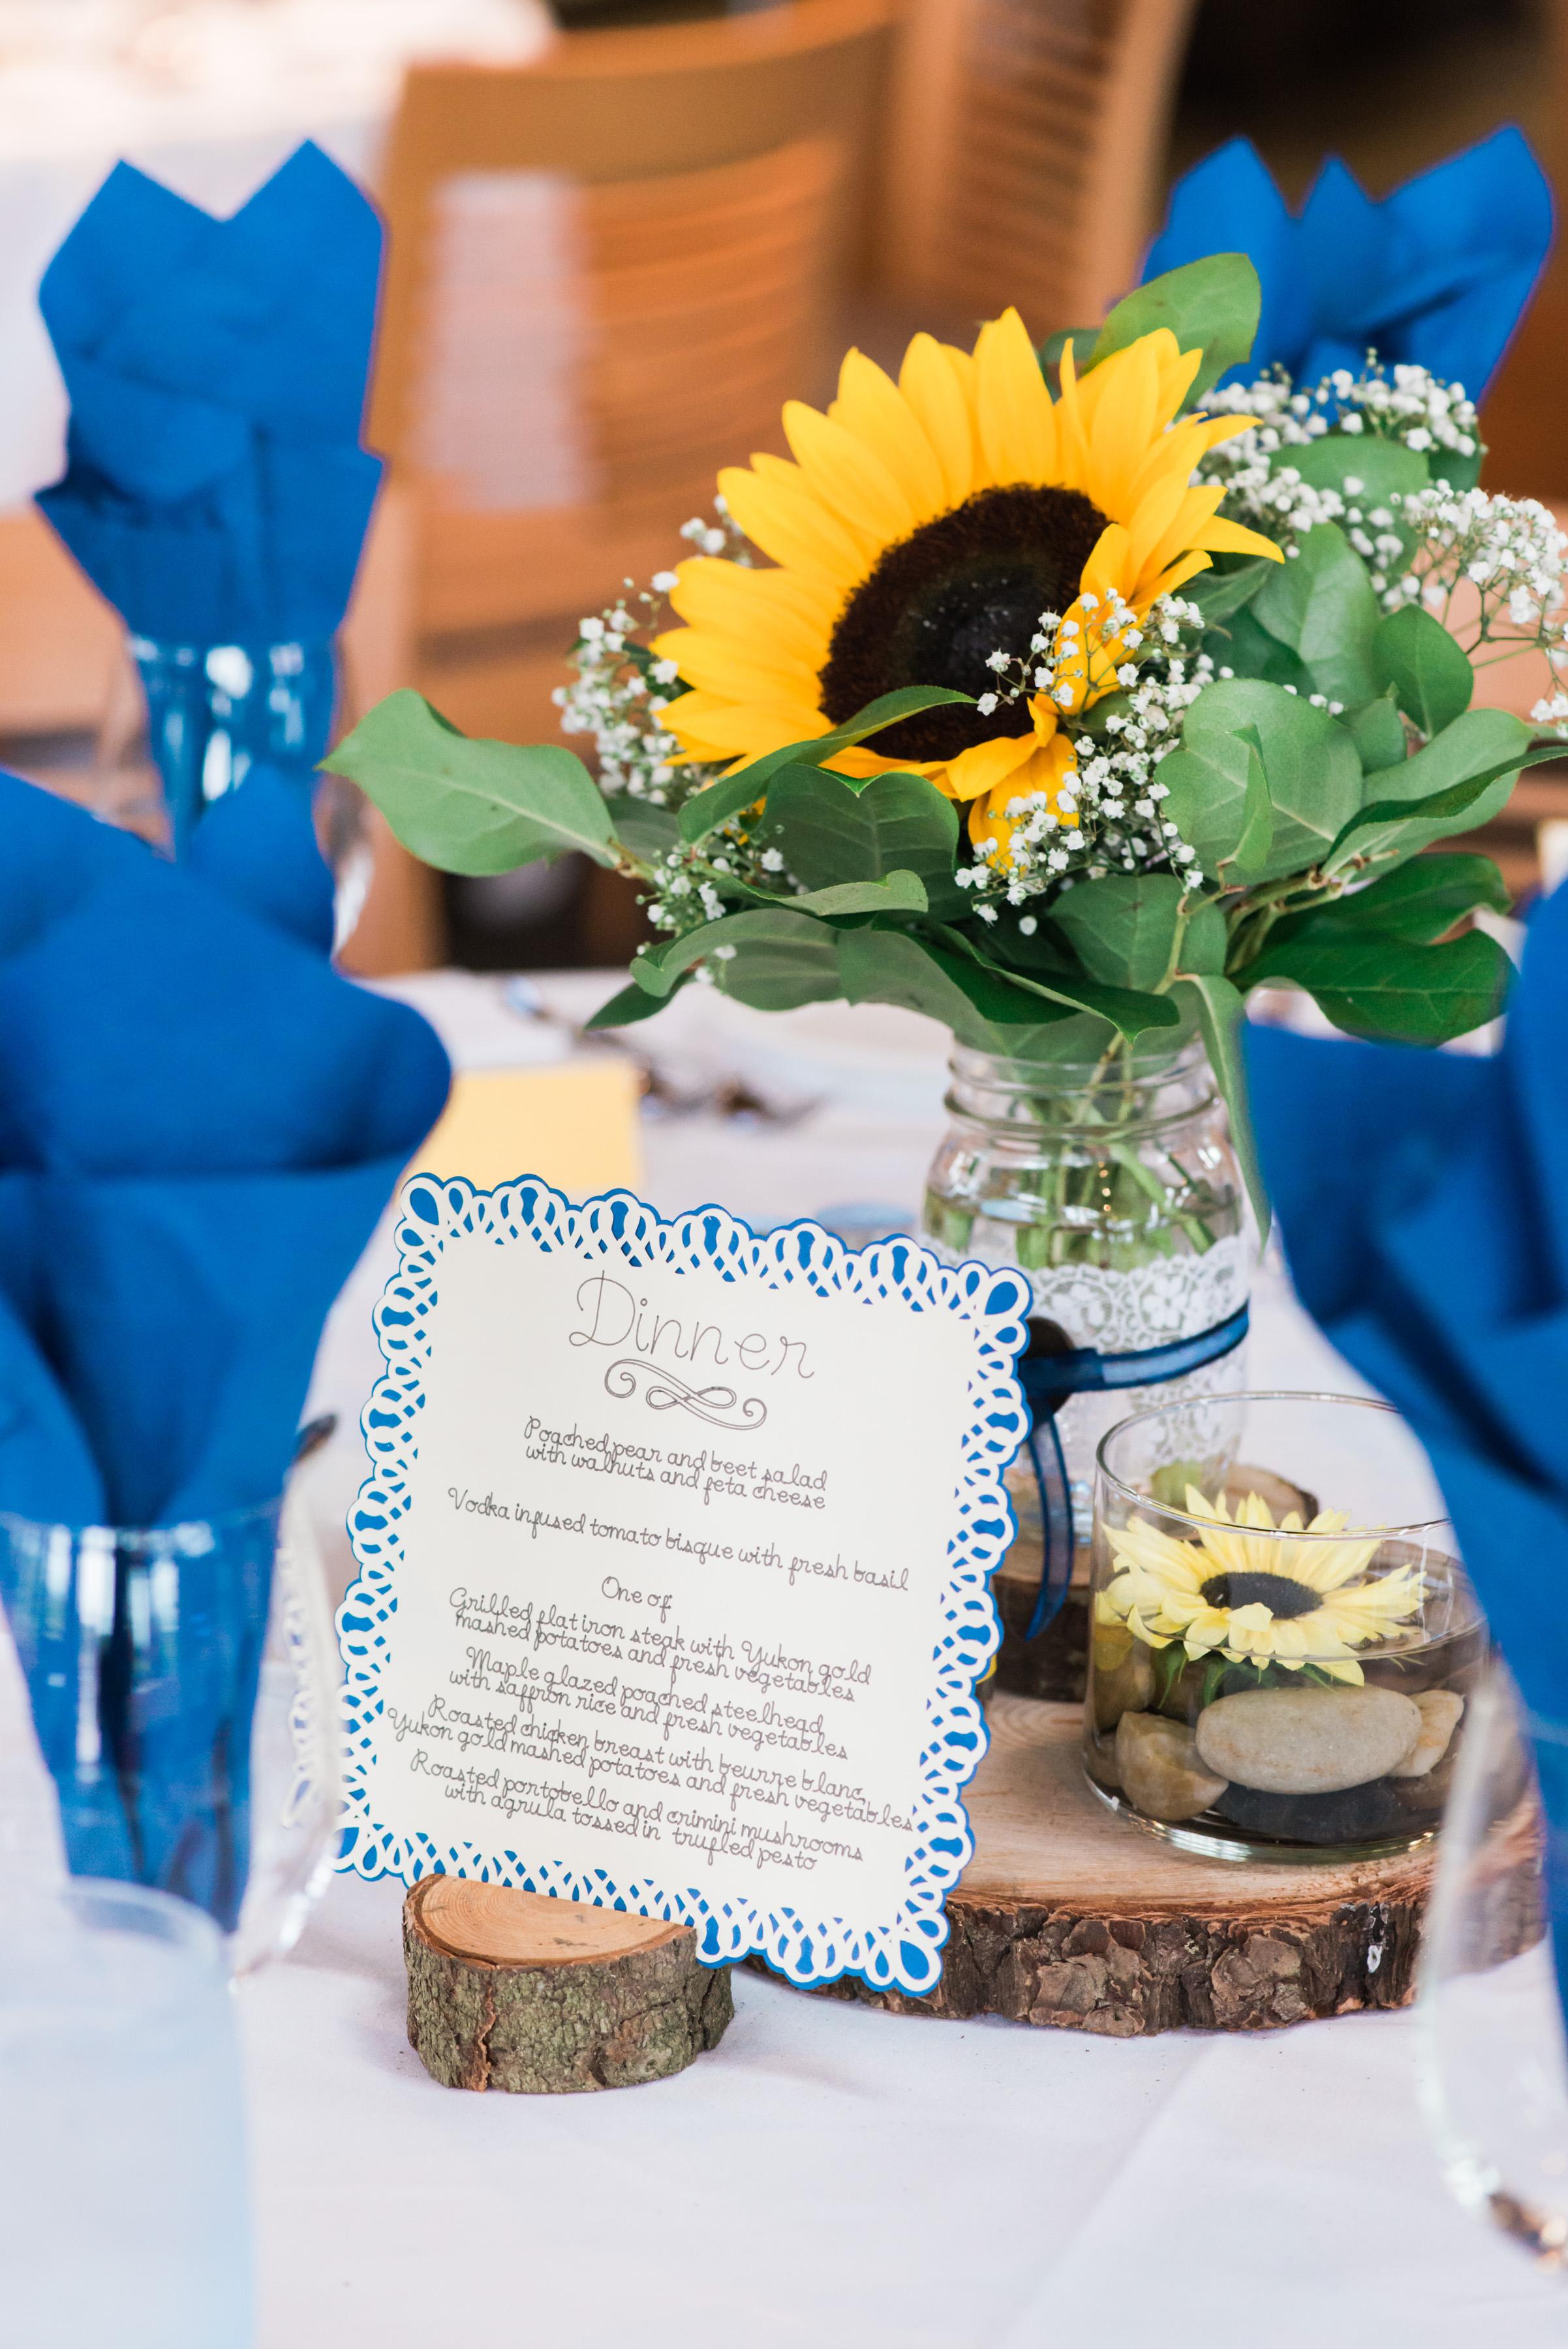 Amanda-rene-wedding-0583-jelger-tanja-photographers.jpg